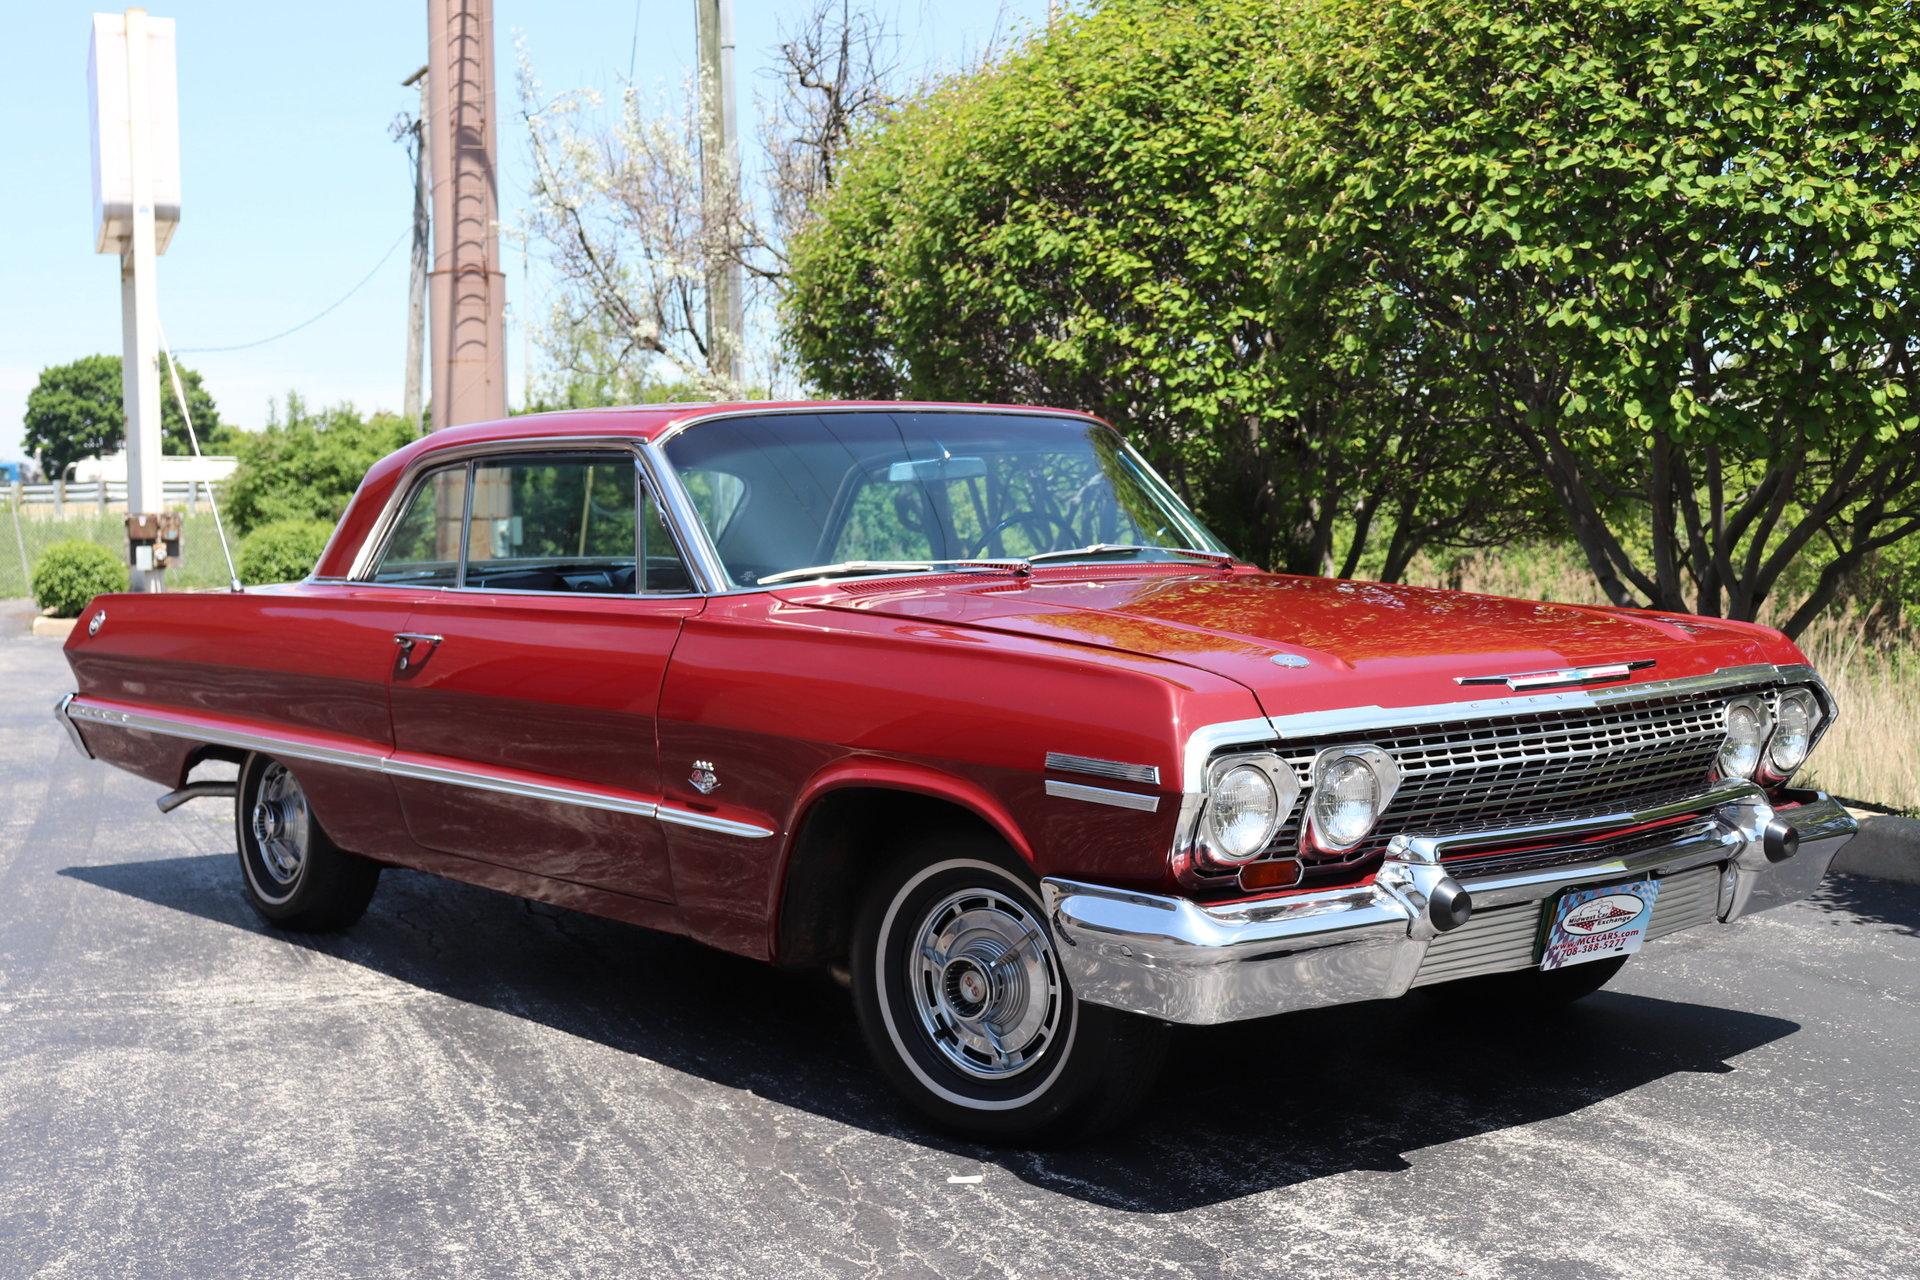 52542529fc45c hd 1963 chevrolet impala ss